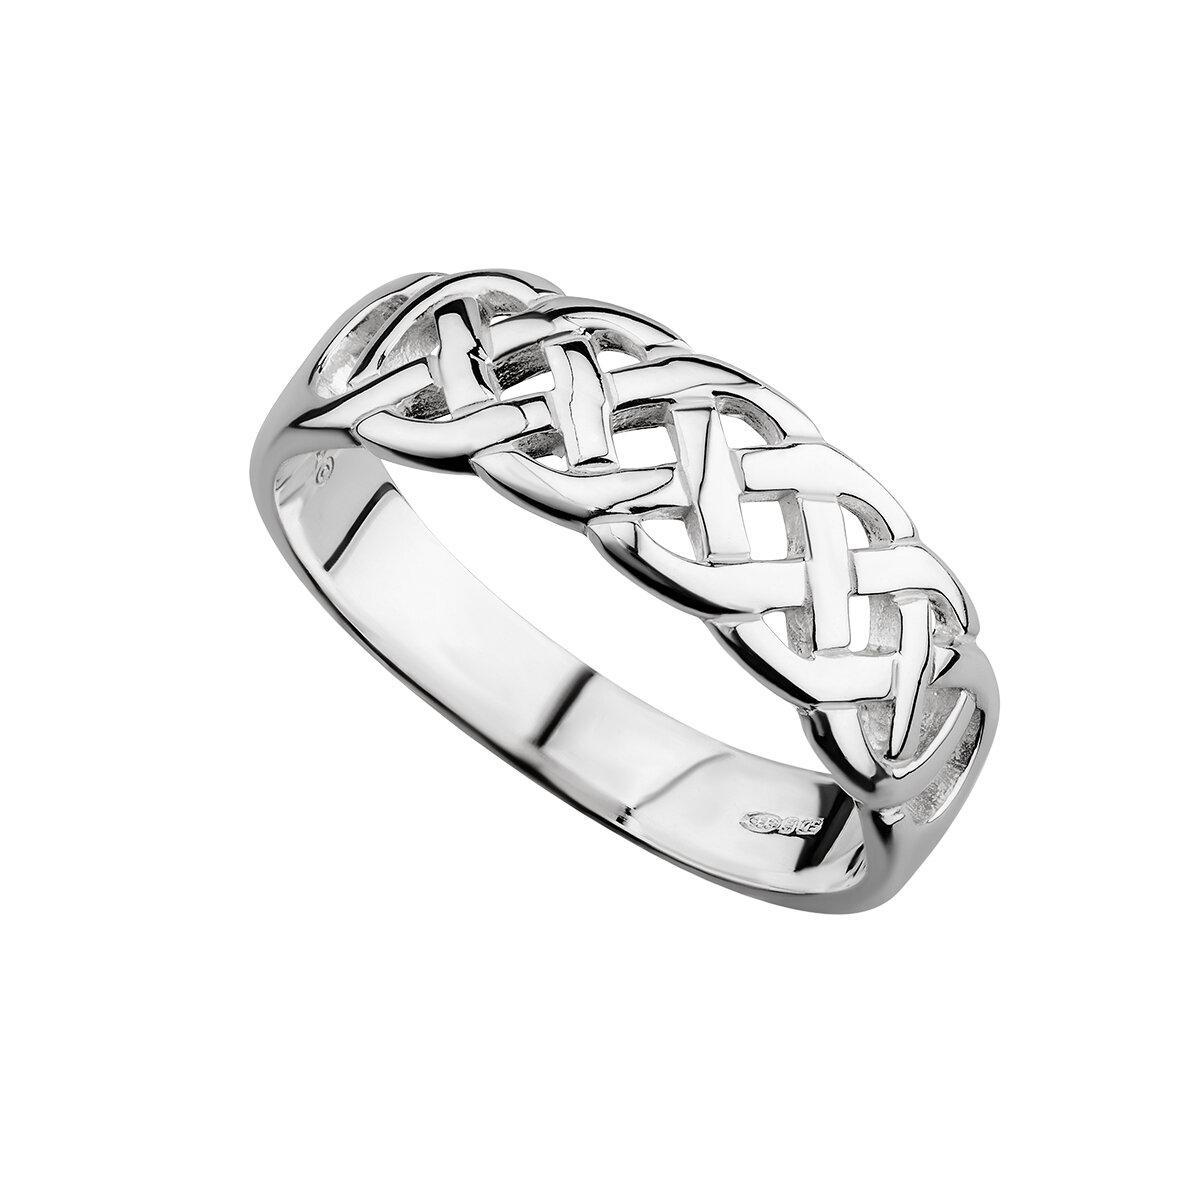 sterling silver celtic woven ring s2405 from Solvar